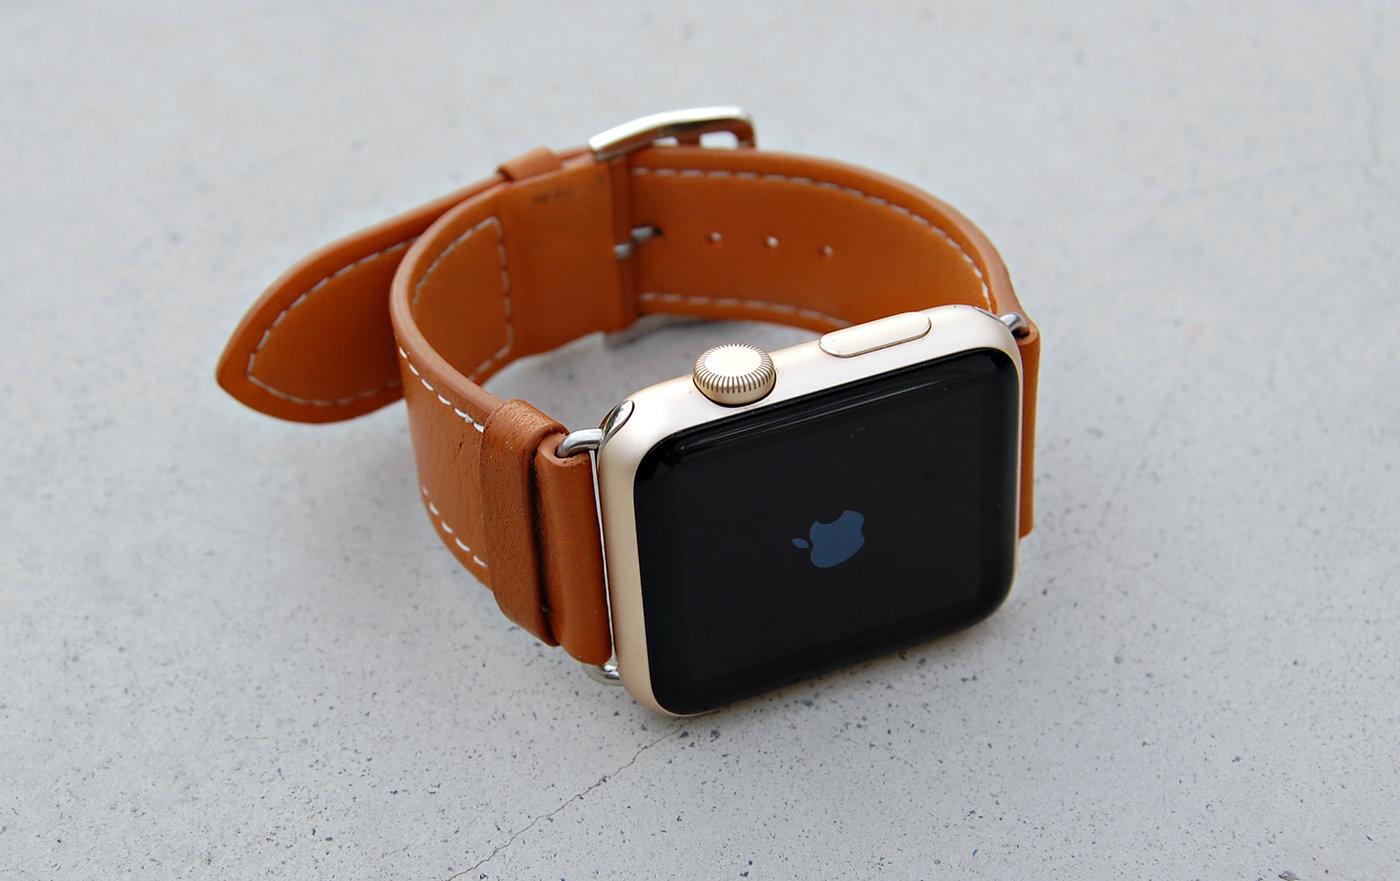 Applewatch3.